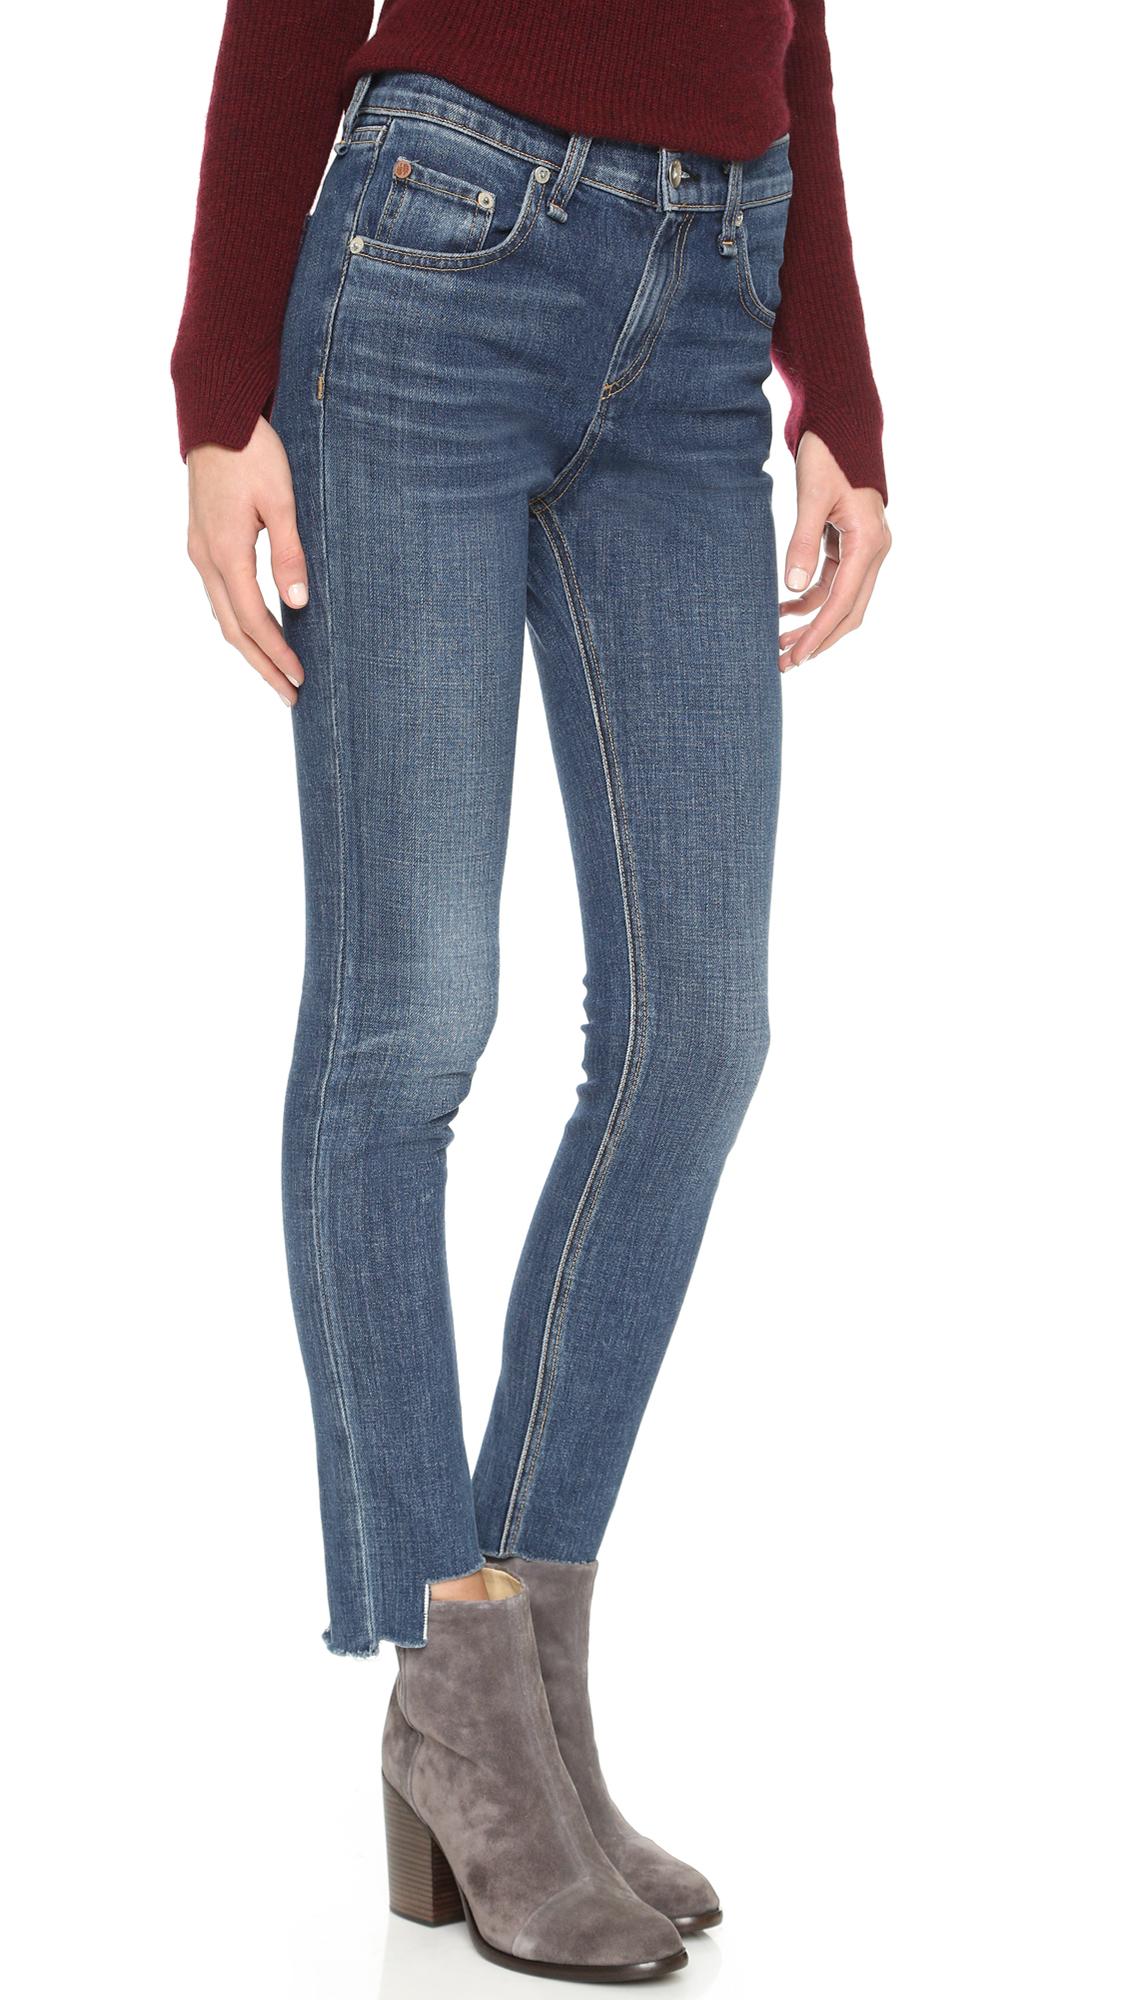 46d58ca84d5 Rag & Bone 10 Inch Destroyed Skinny Jeans - Hampton in Blue - Lyst